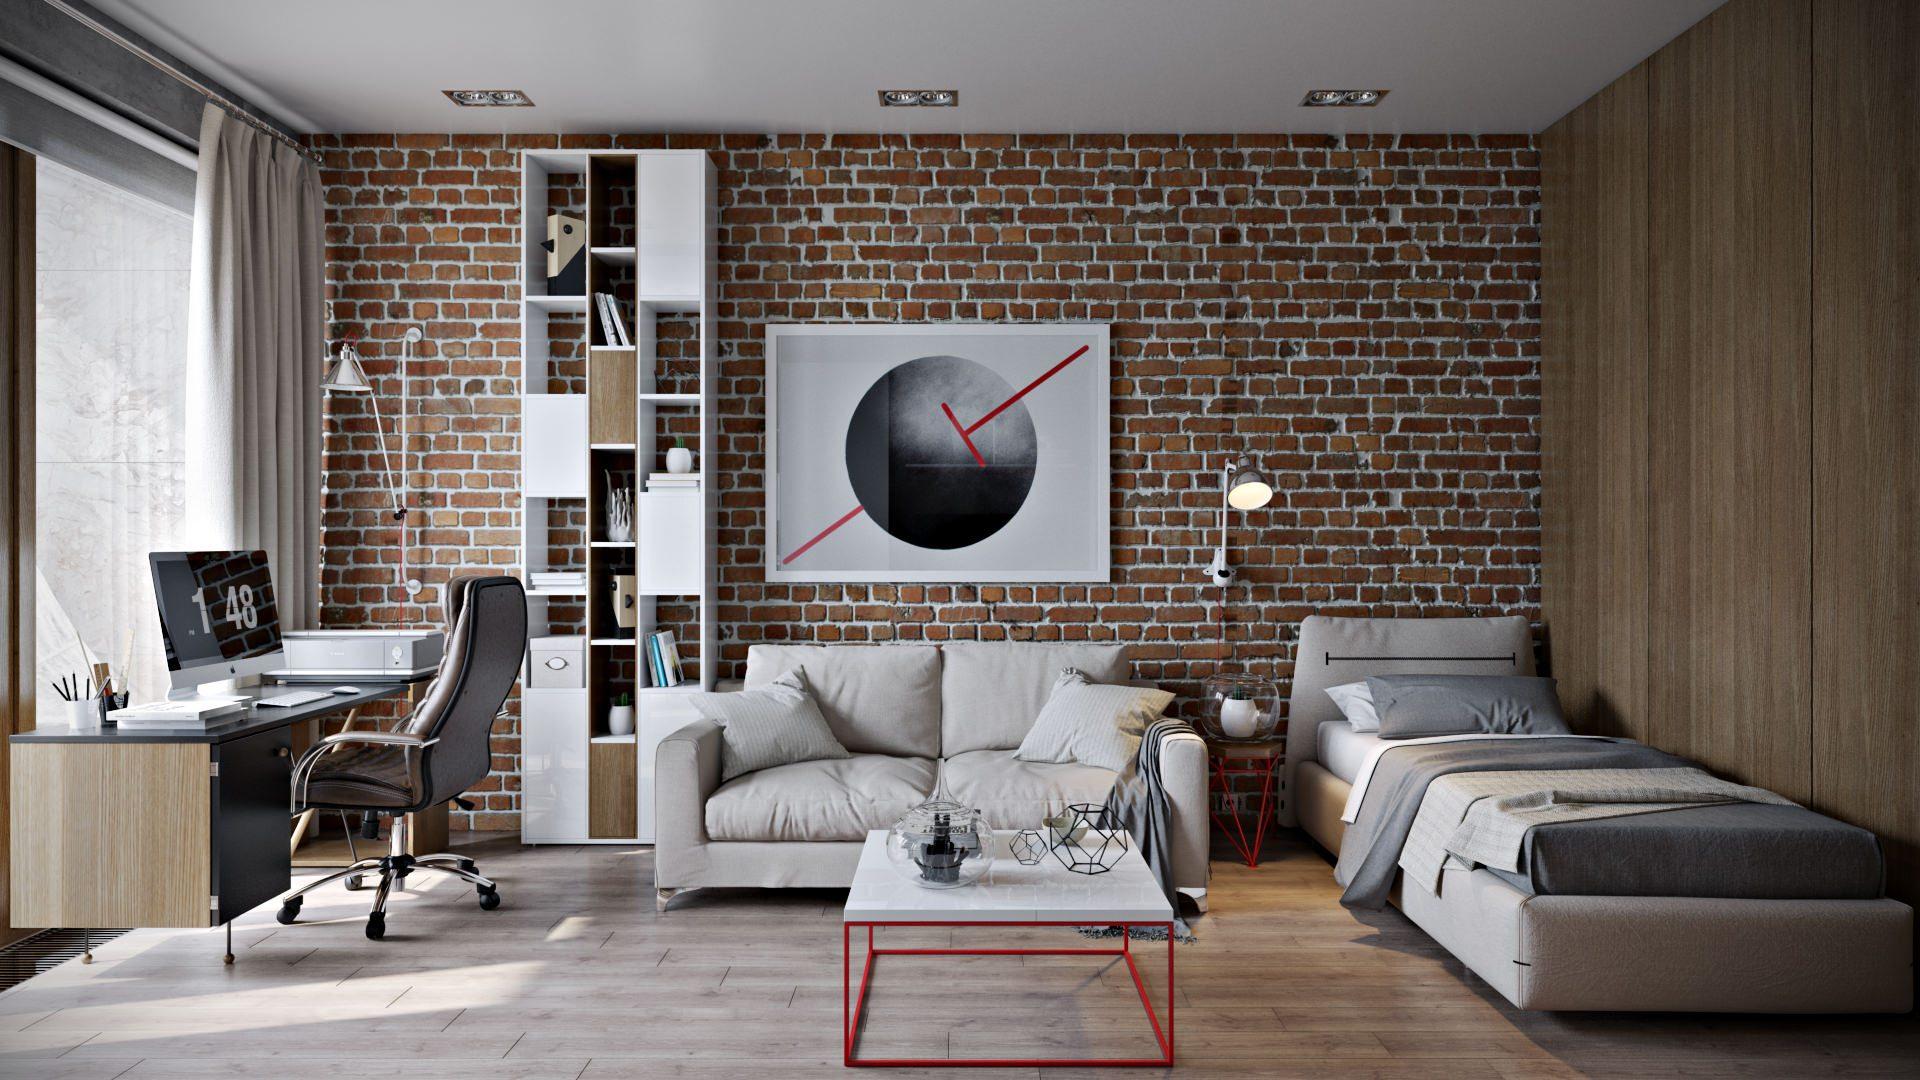 Photorealistic CGI for a Multi-Purpose Living Room Concept